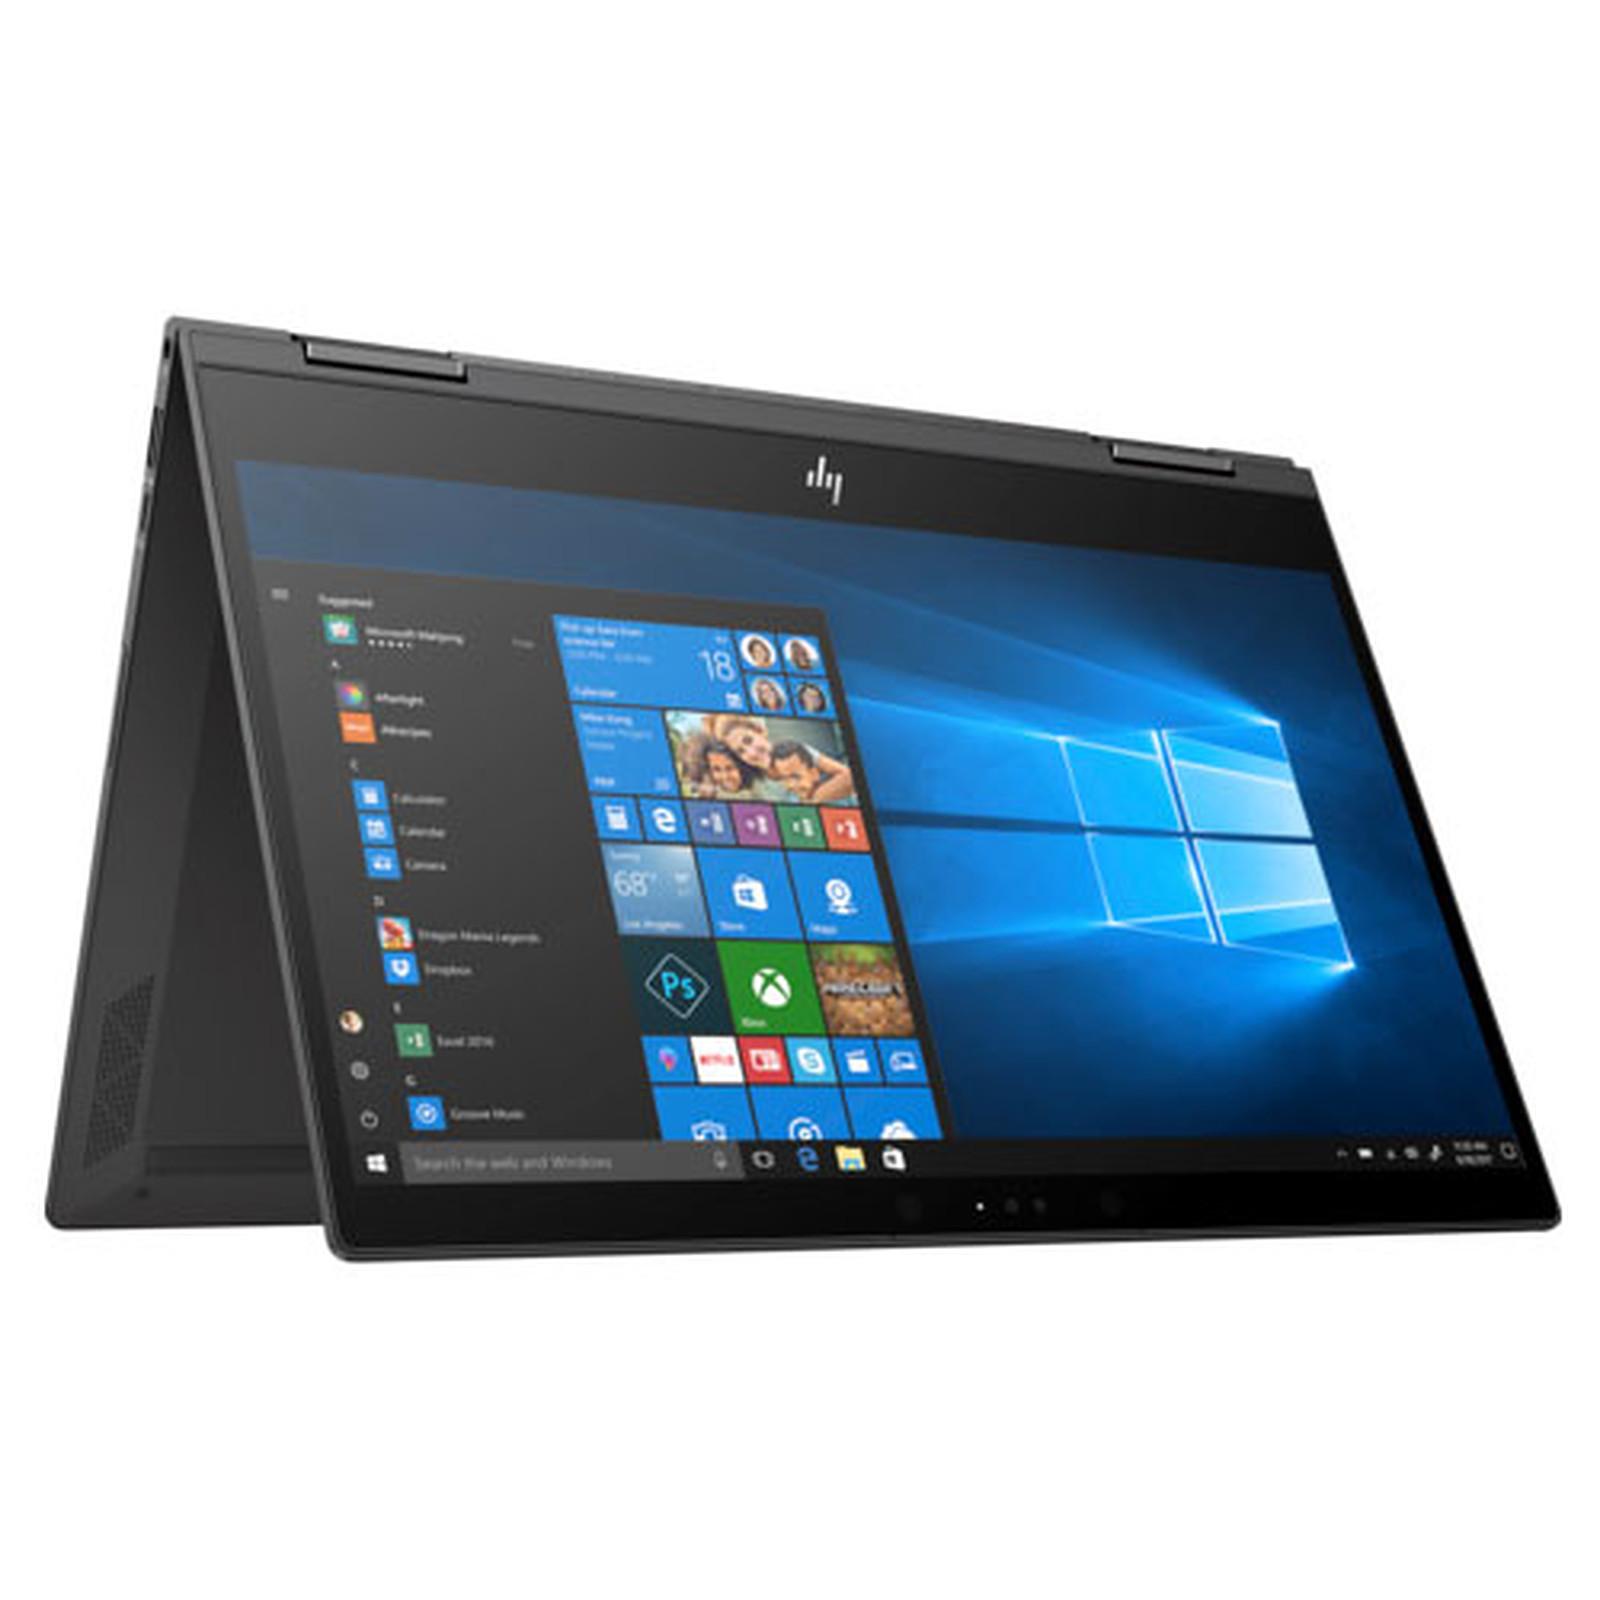 HP ENVY x360 13-ar0007nf (7GY98EA)